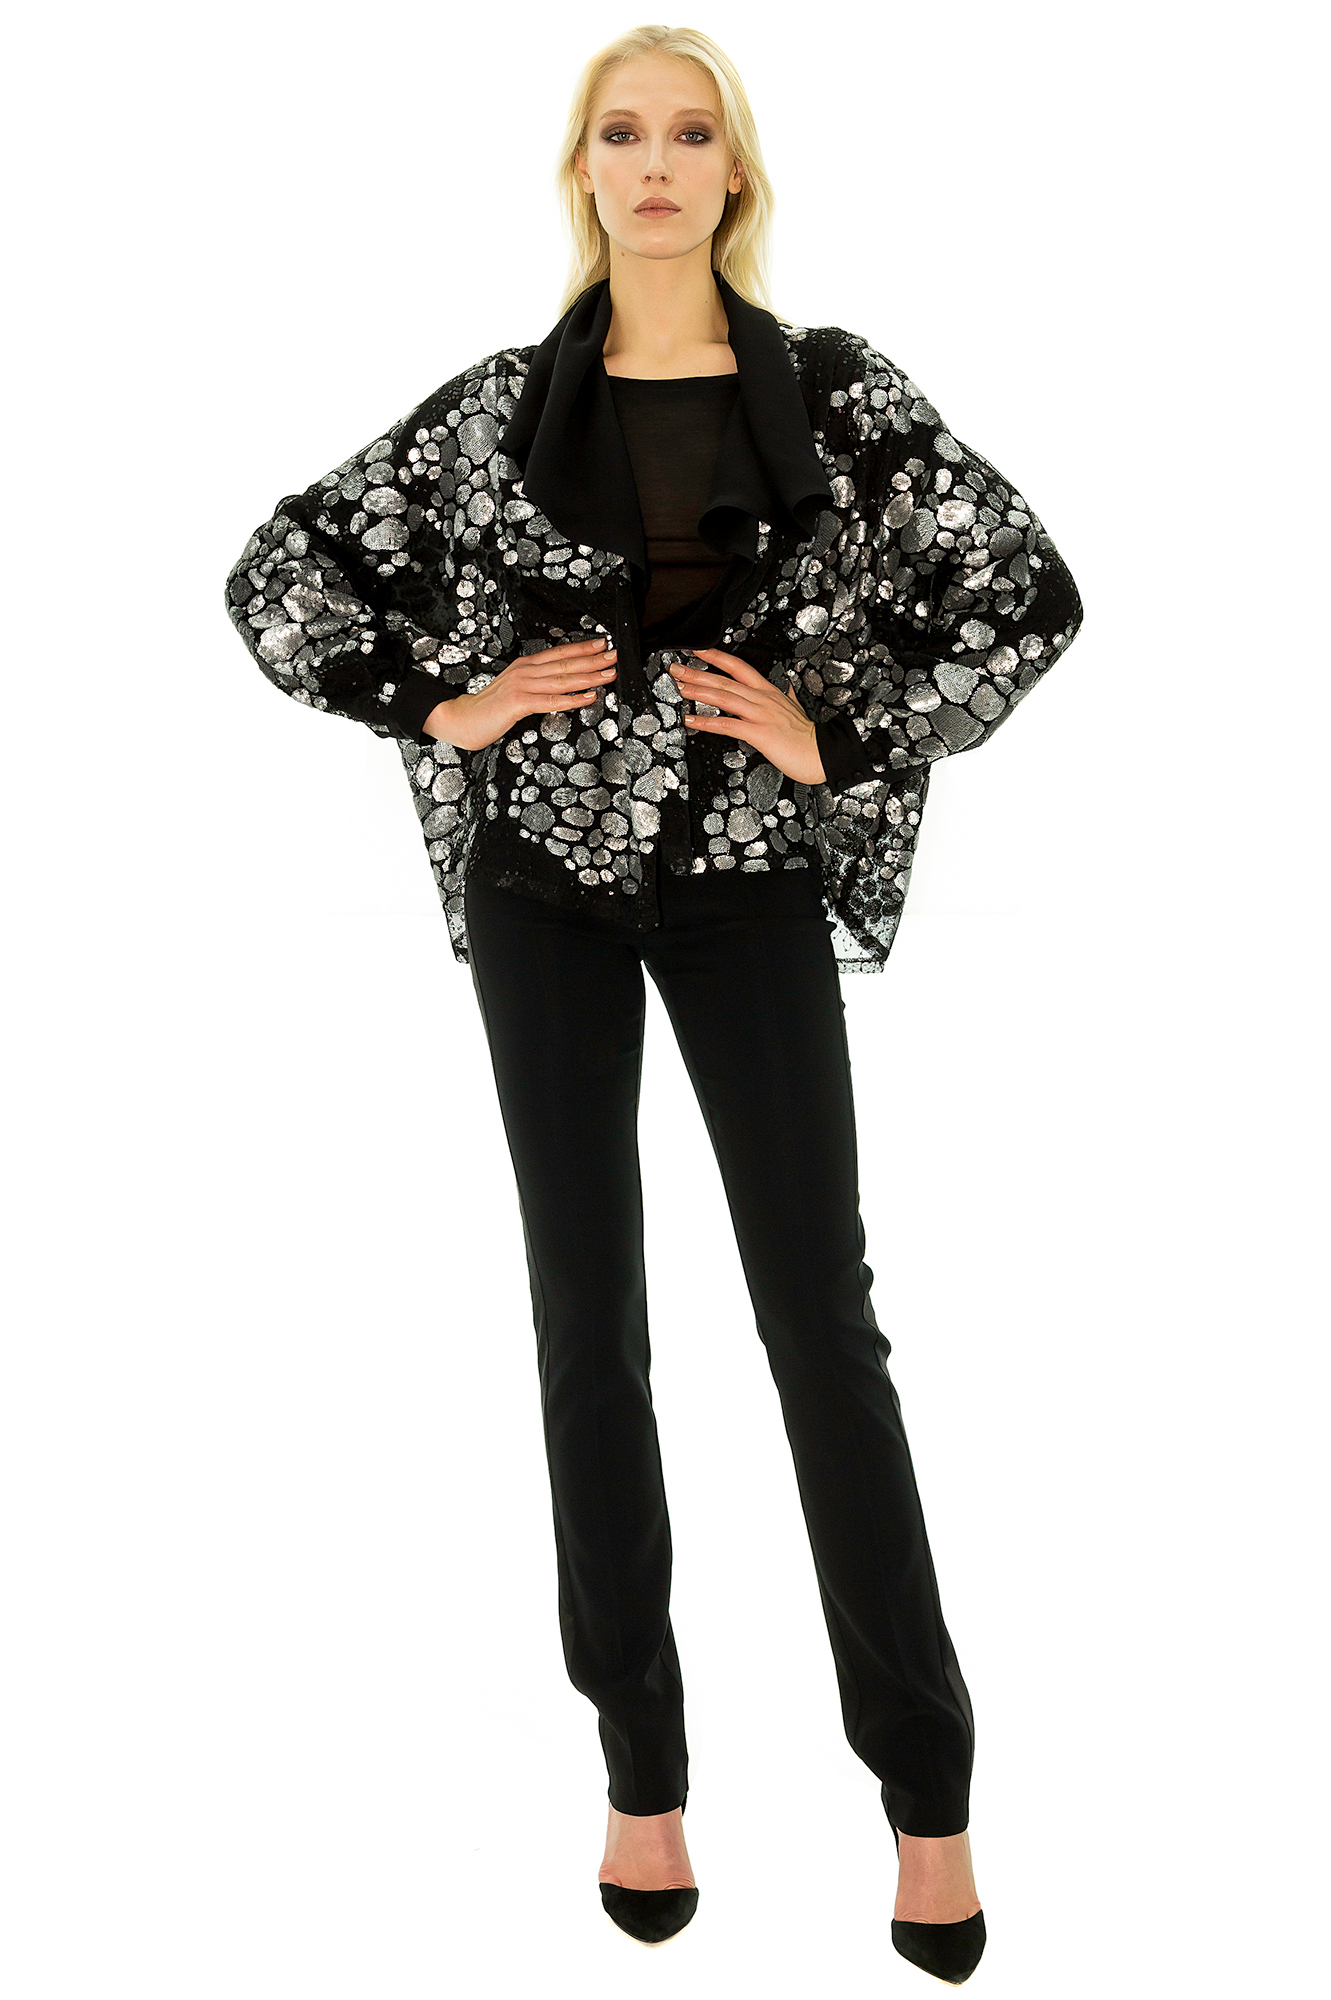 top habill bolero pour robe bolero brod alexandrina turcan stefanie renoma. Black Bedroom Furniture Sets. Home Design Ideas